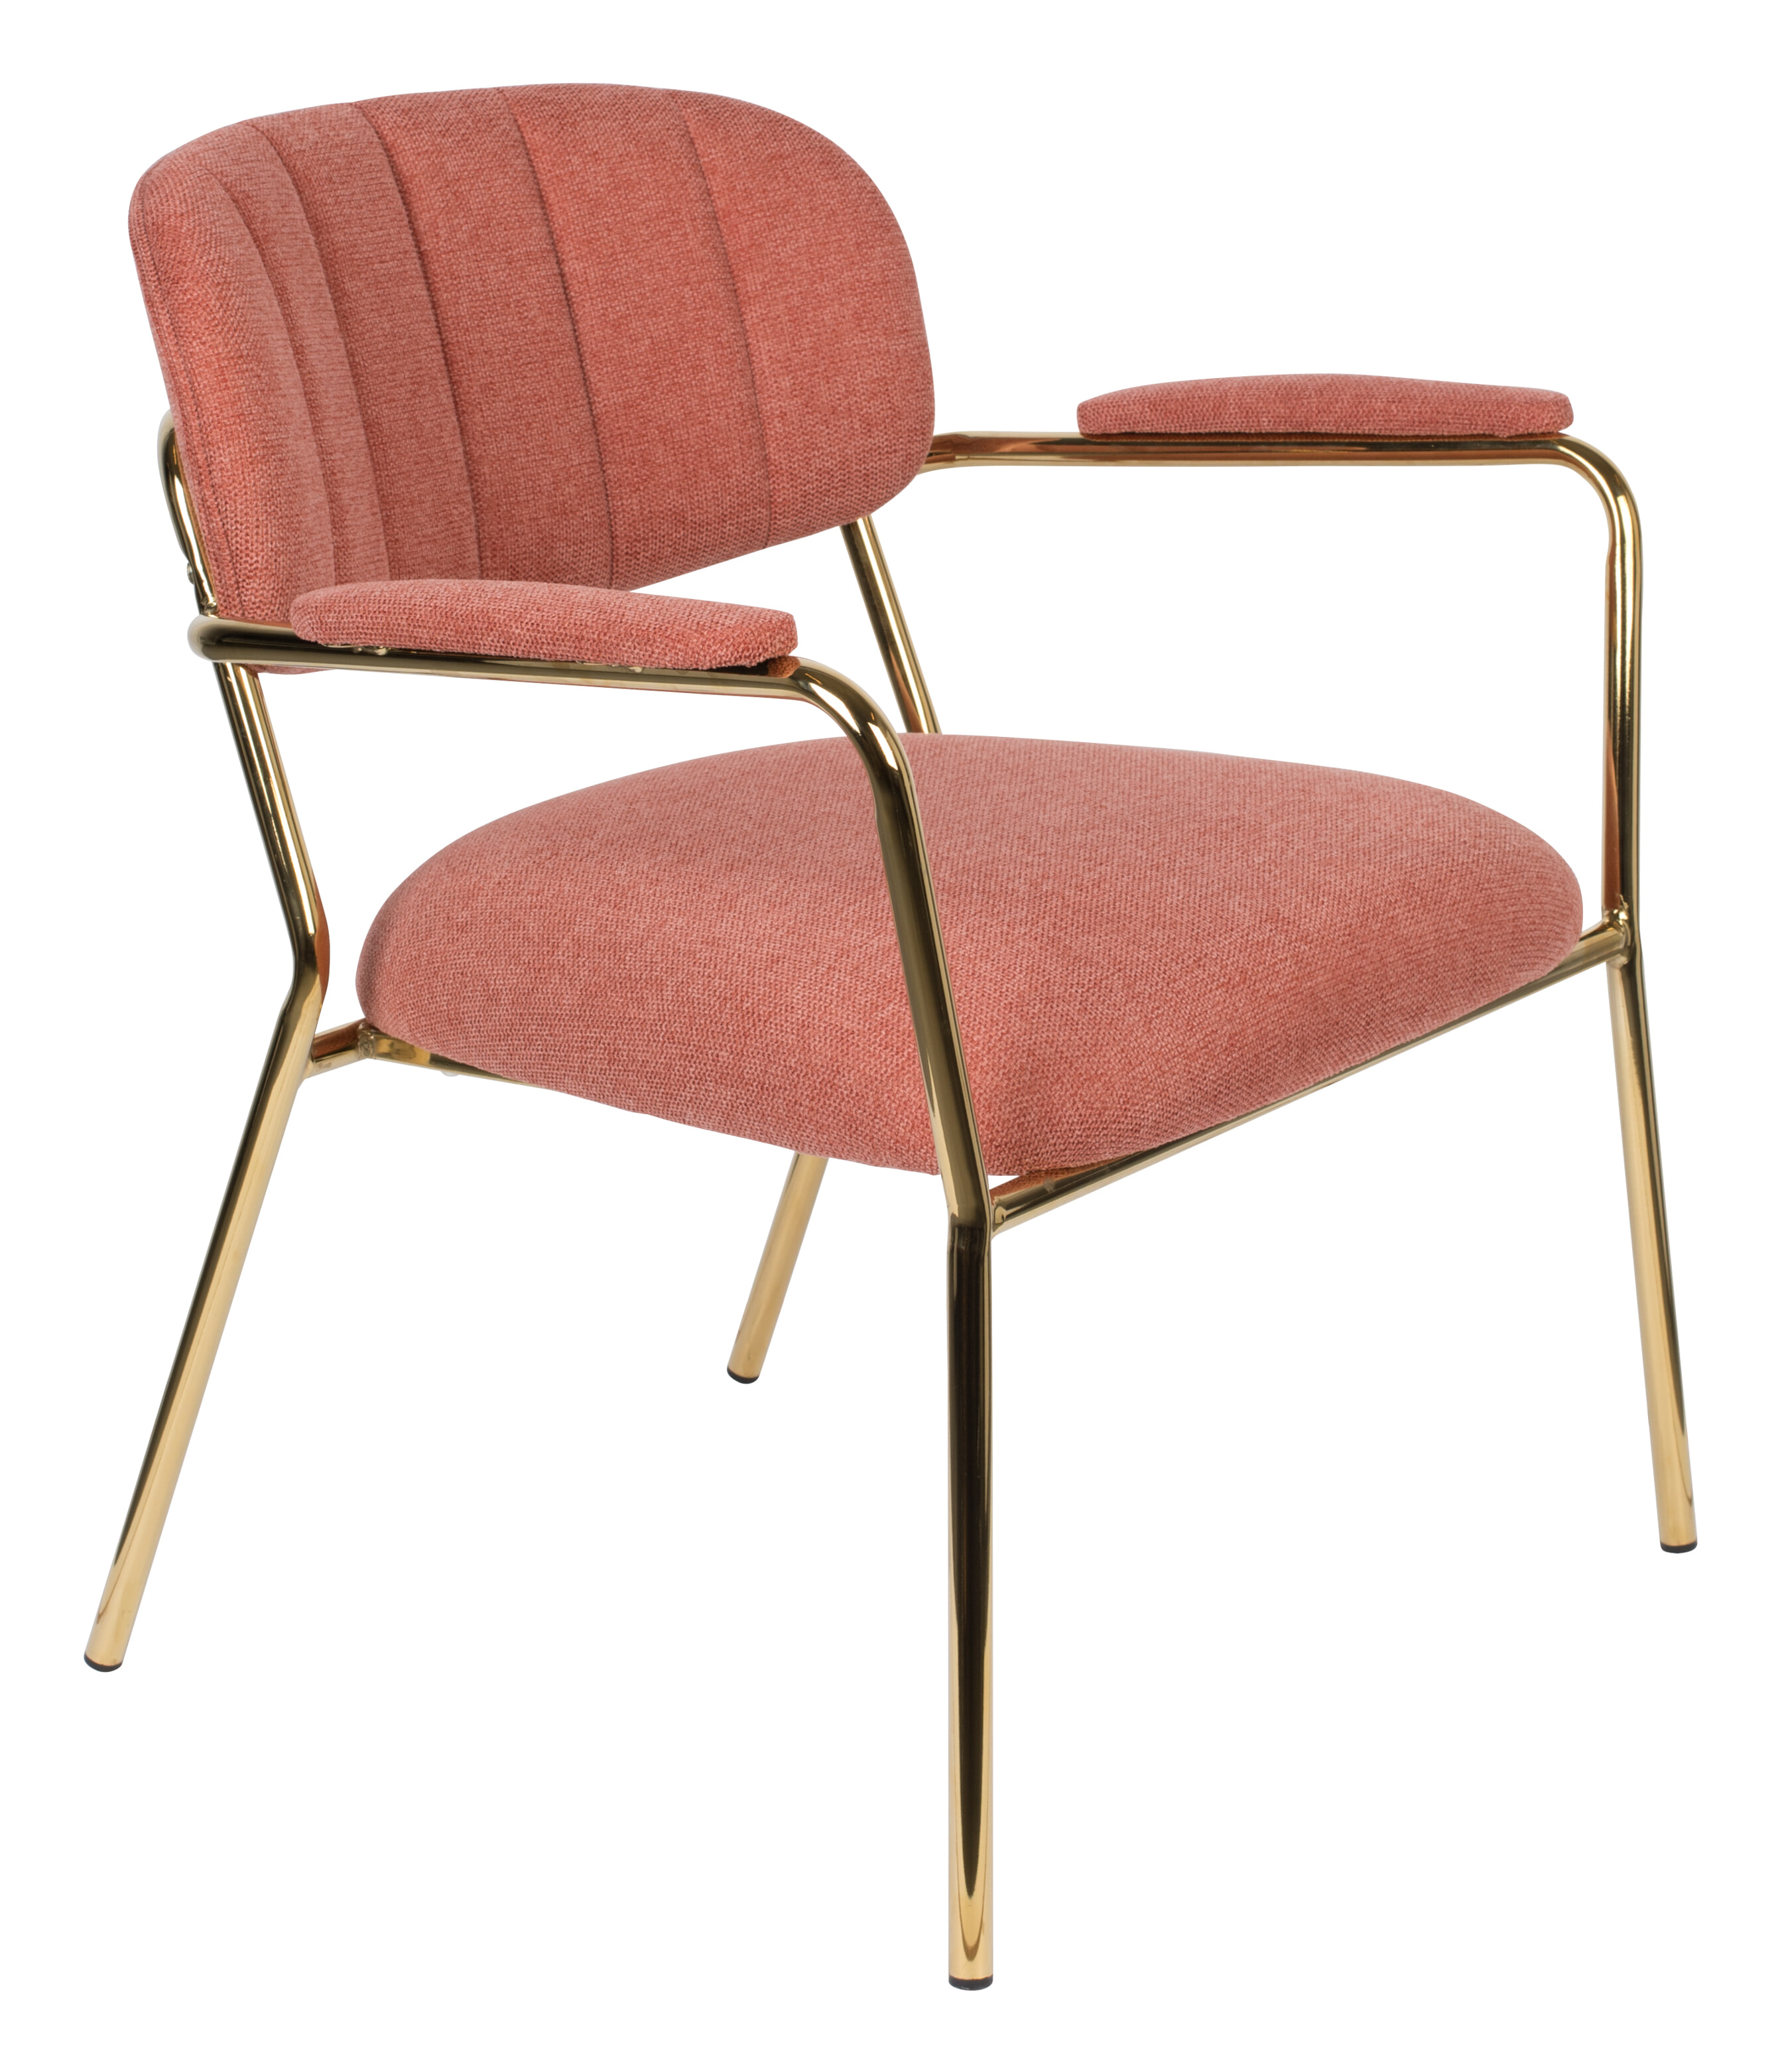 ZILT Fauteuil 'Kolten' met armleuning, kleur Goud/Roze